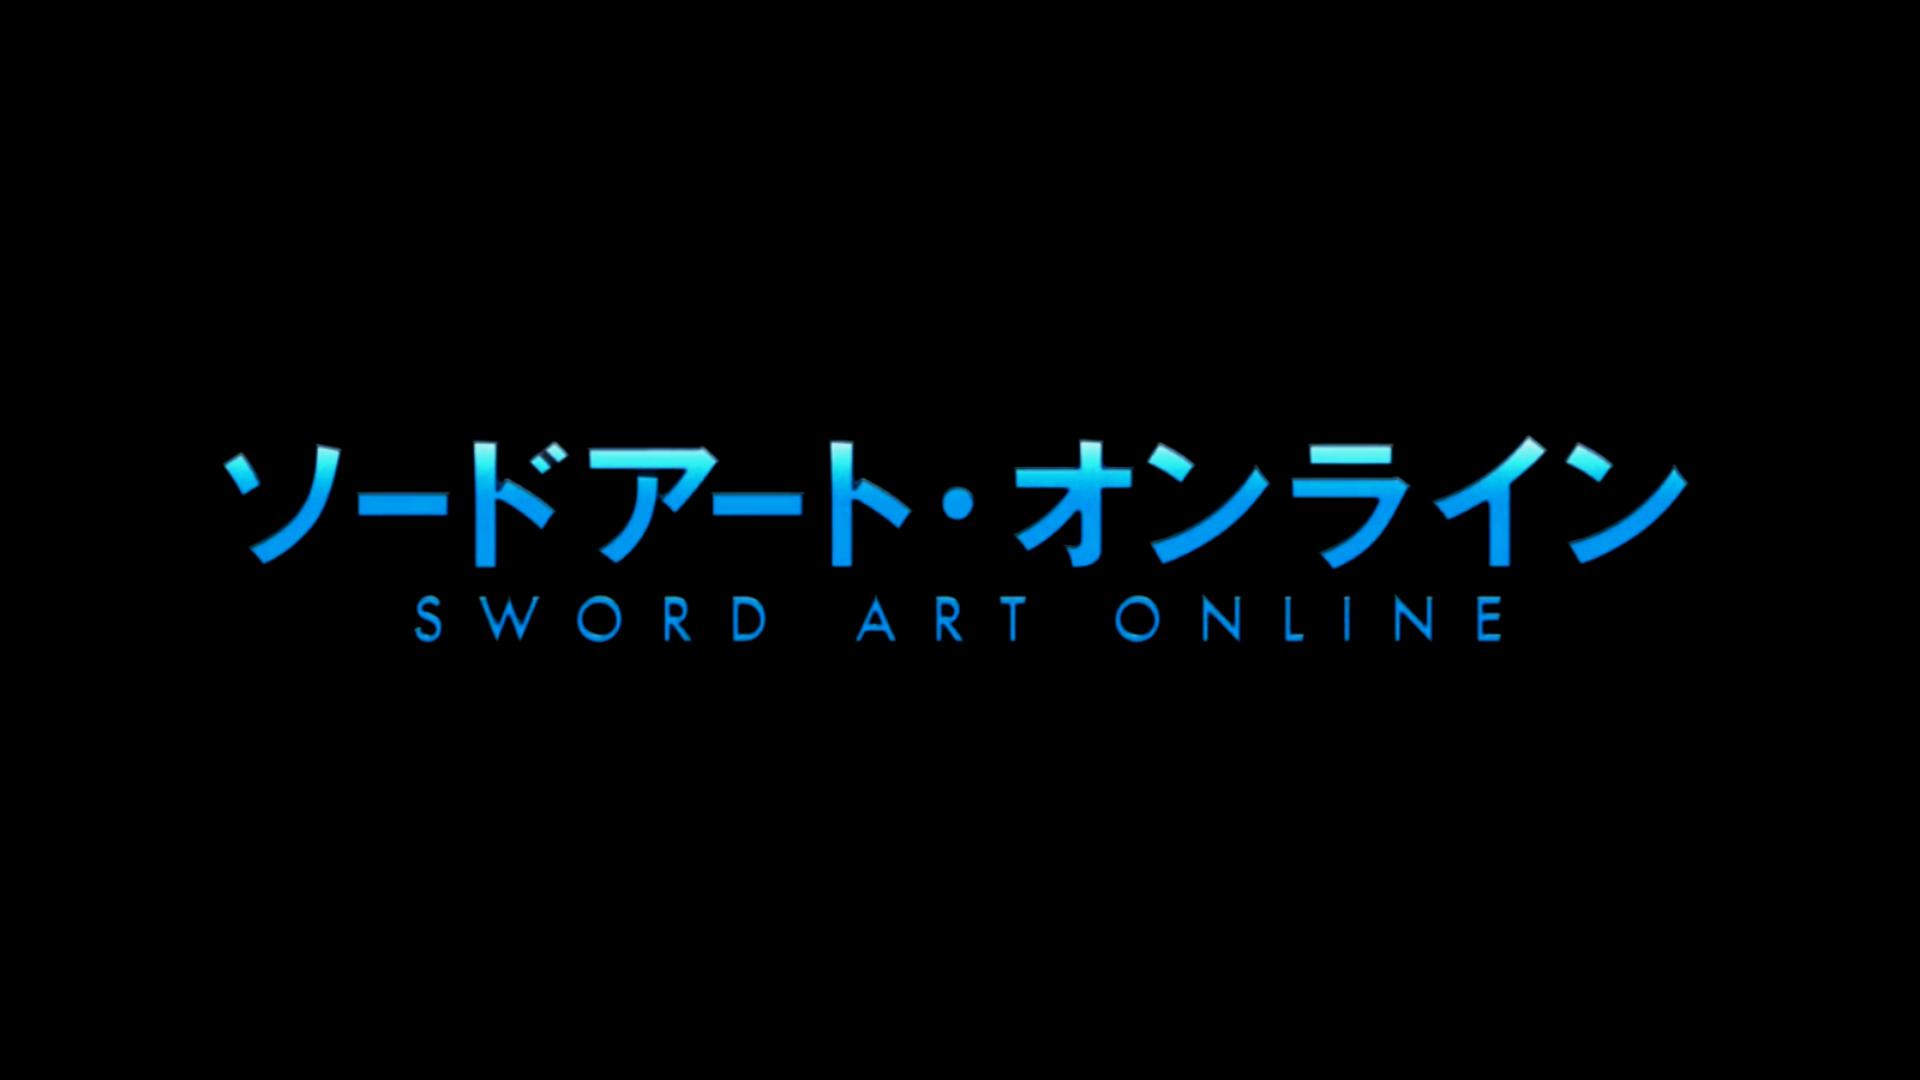 1000 images about wallpaper on pinterest - Sword art online wallpaper 720x1280 ...